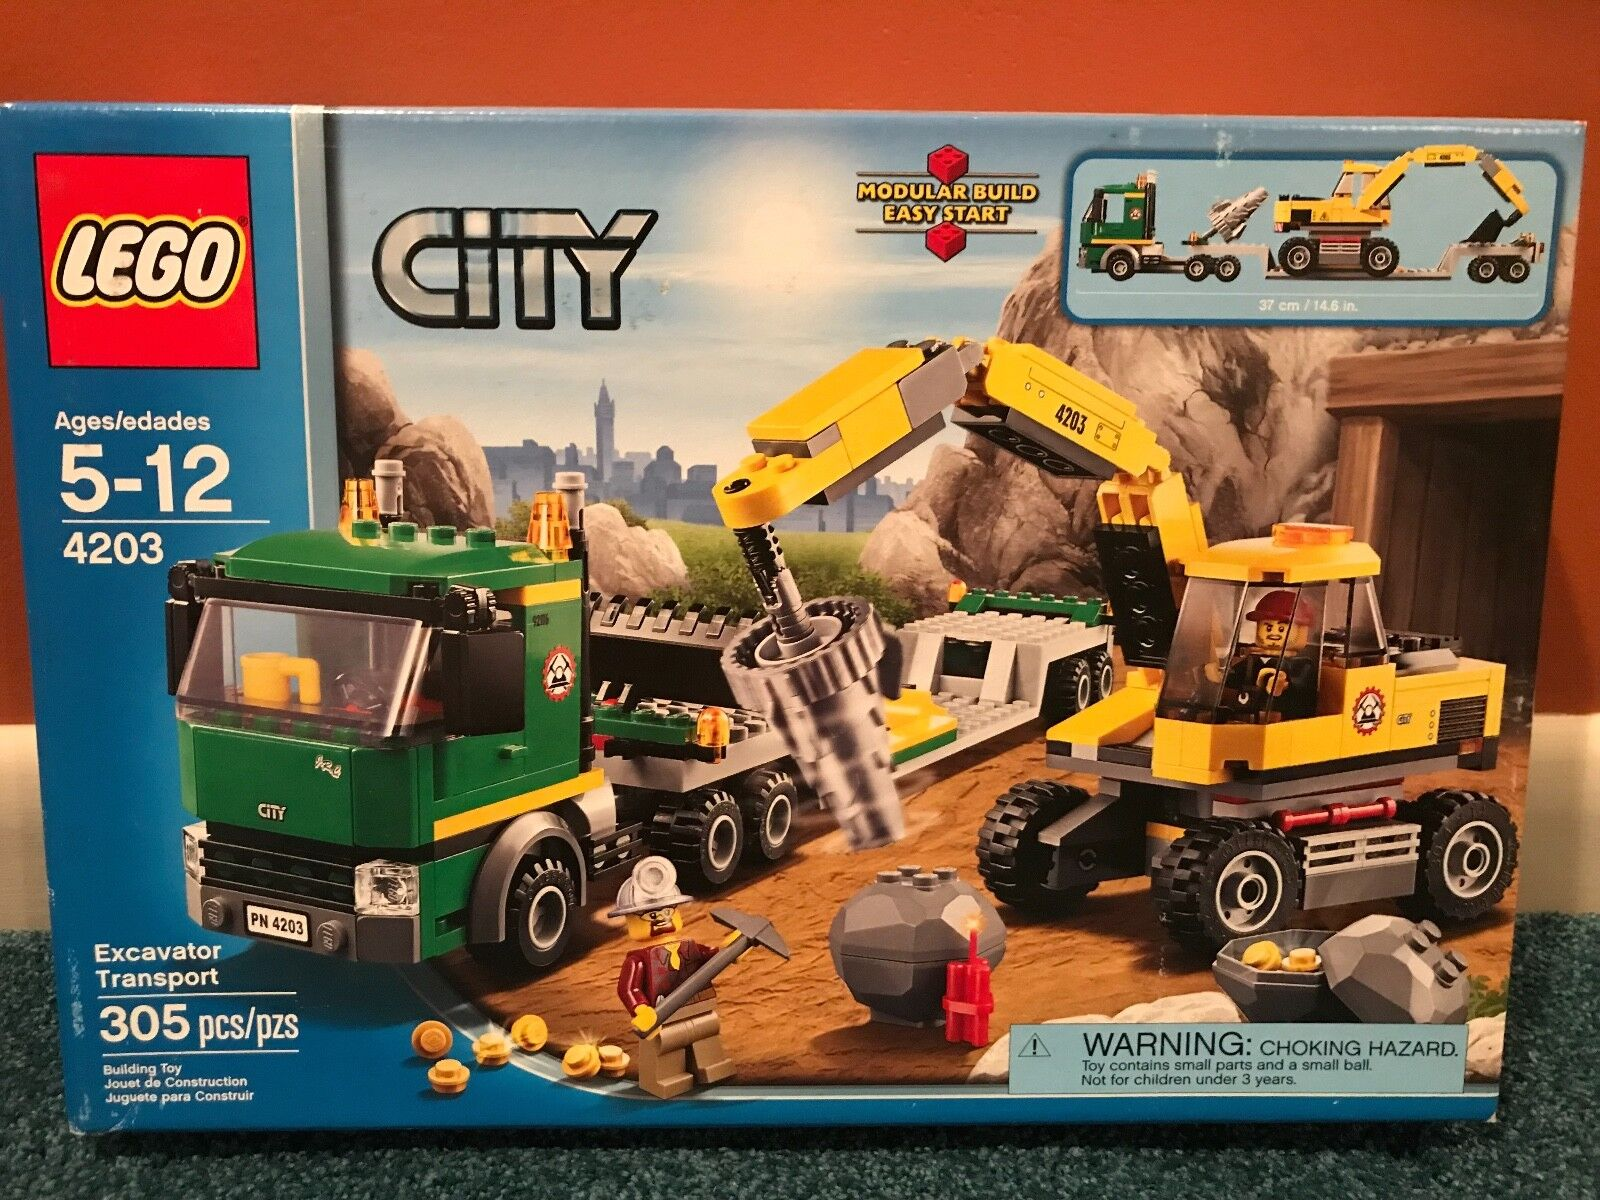 Lego City 4203 Excavator Transport Mining Truck NIB, Unopened, Unused